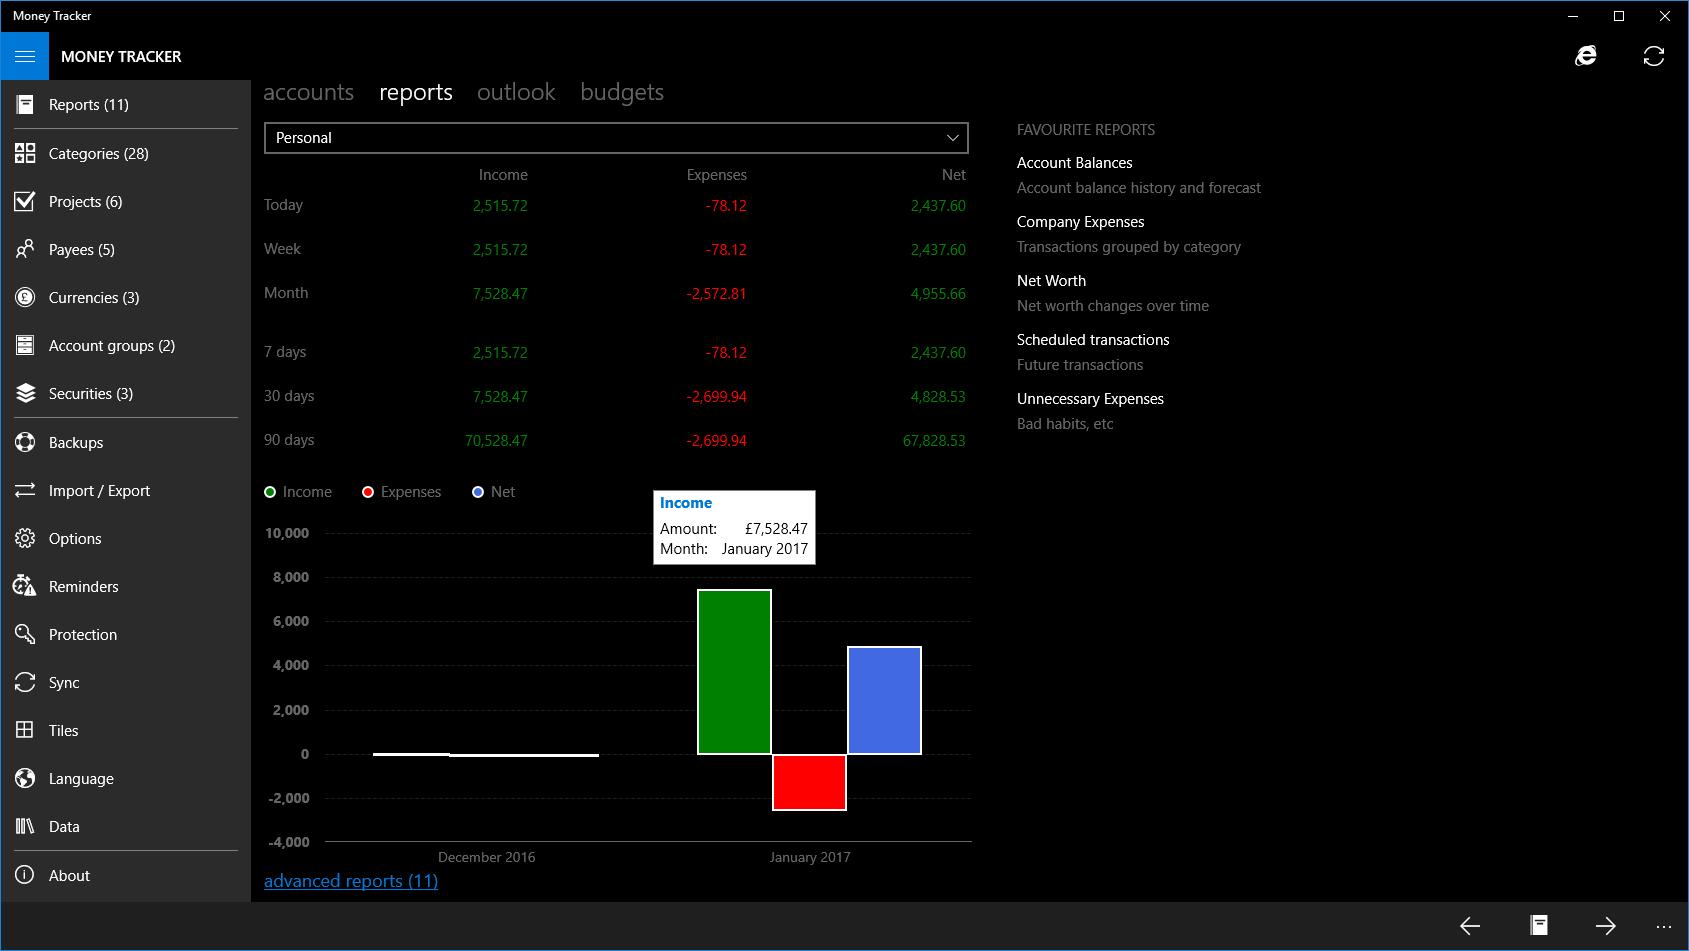 Money Tracker Pro